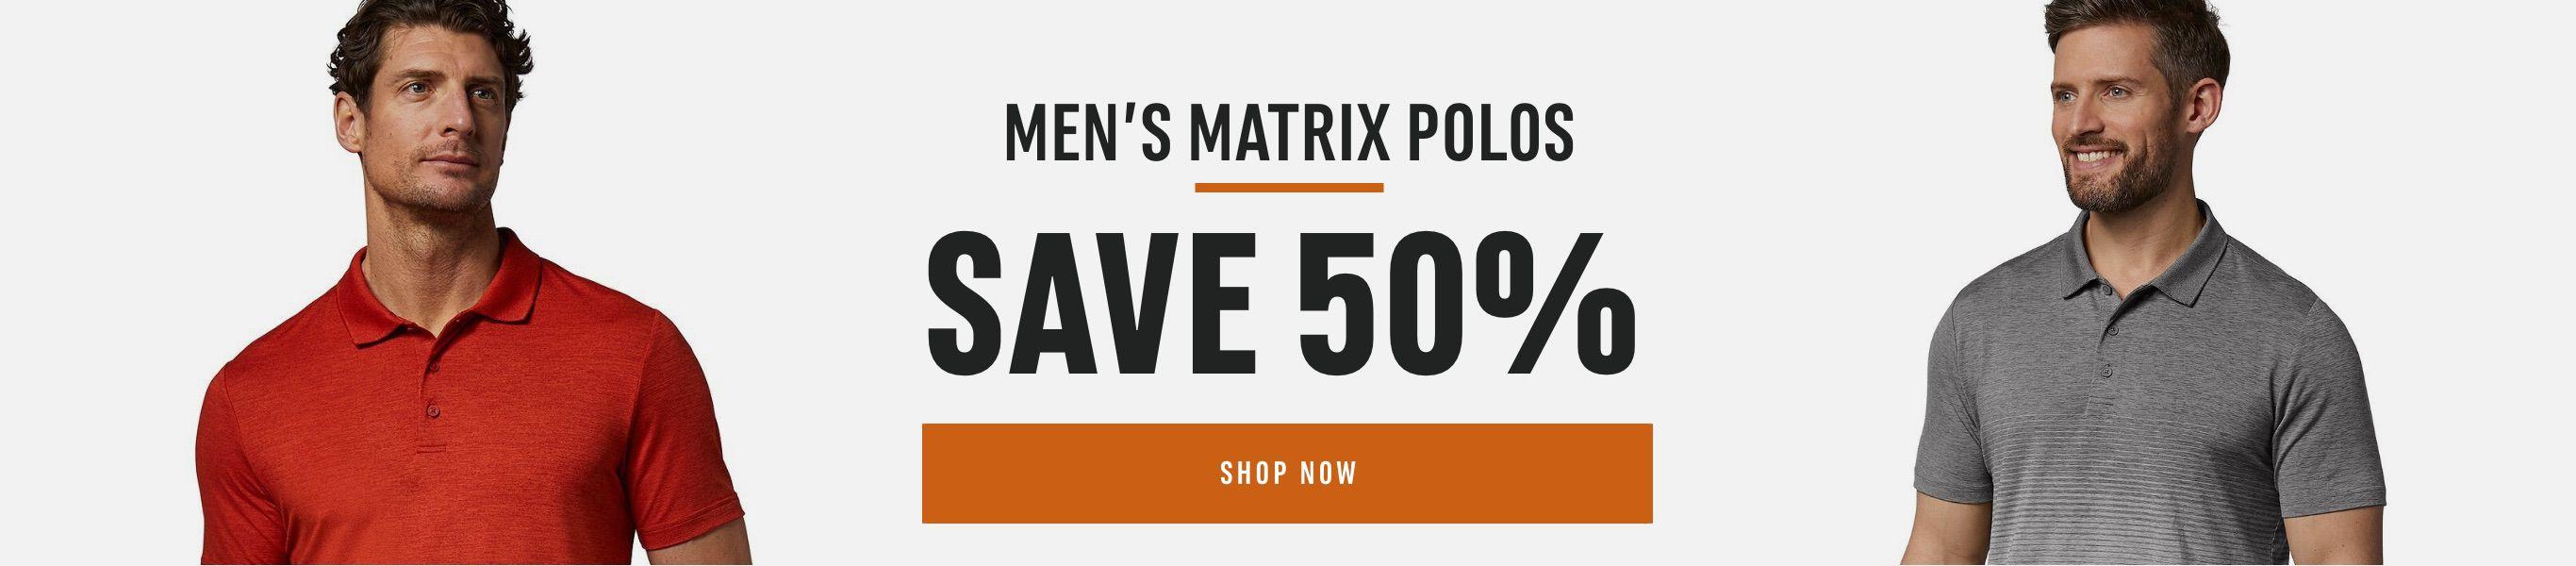 Men's Matrix Polos: Save 50%